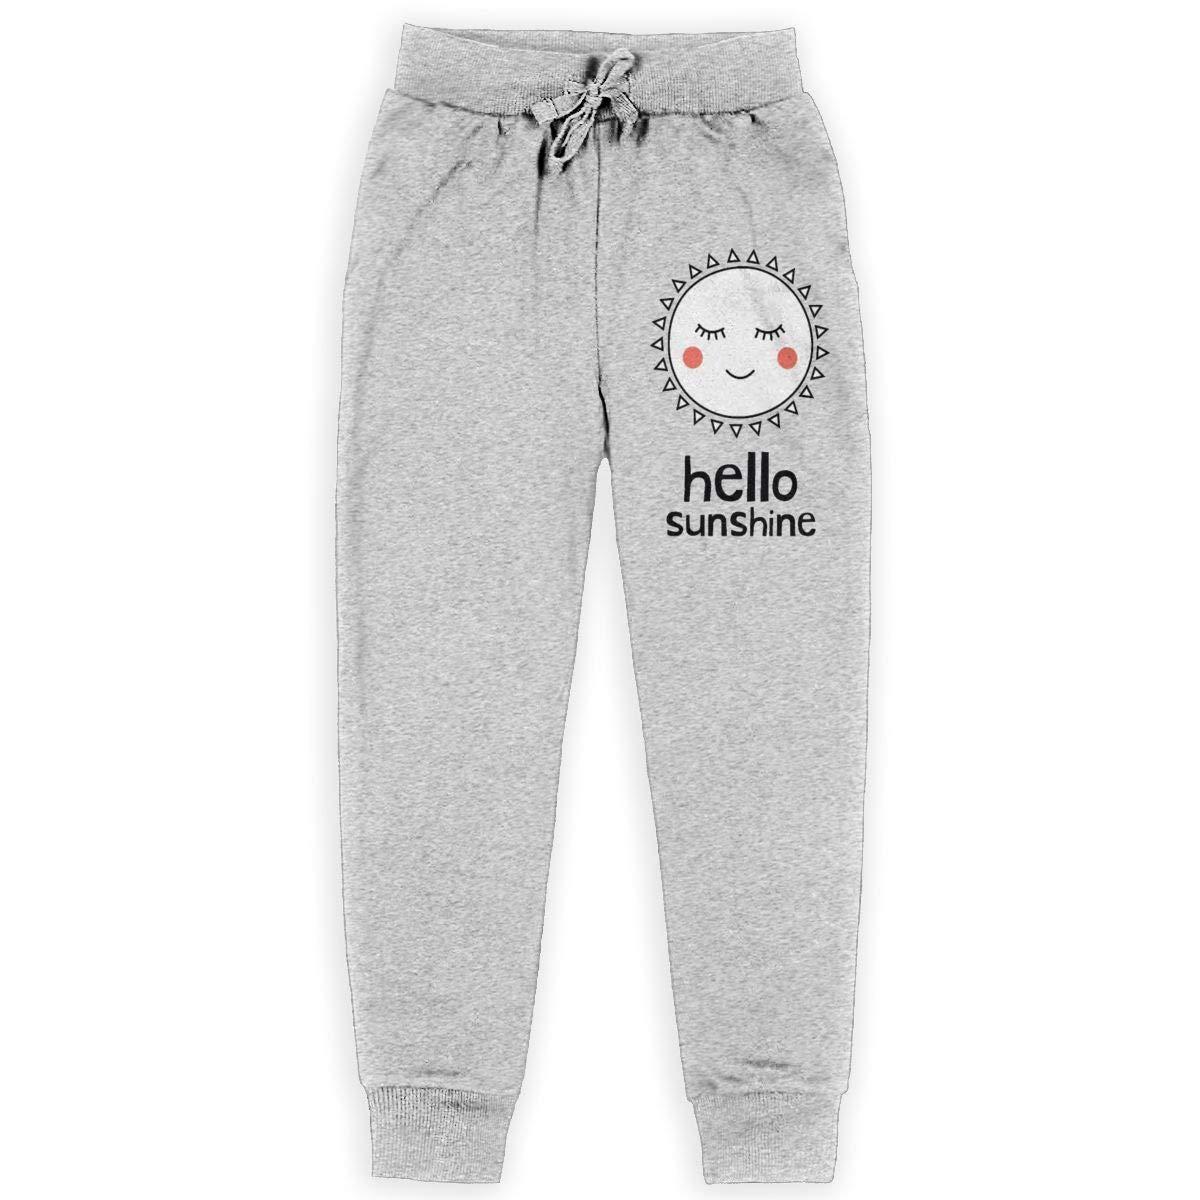 Sunshine Store Hello Sunshine Boys Girls Teenage Long Sweatpant Jogger Pants